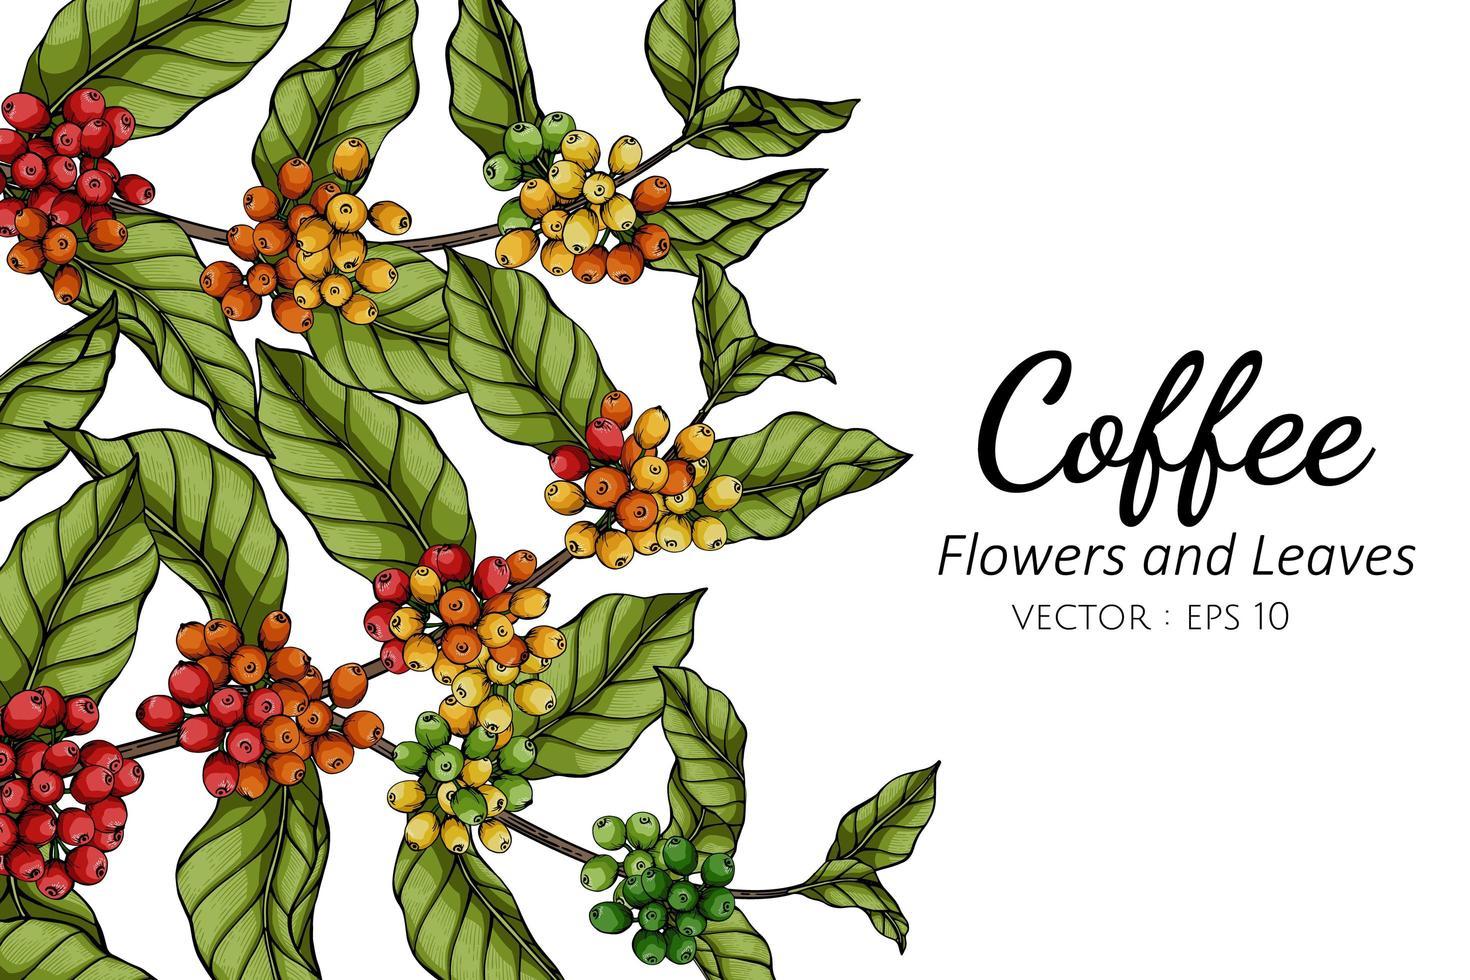 disegno di fiori e foglie di caffè vettore